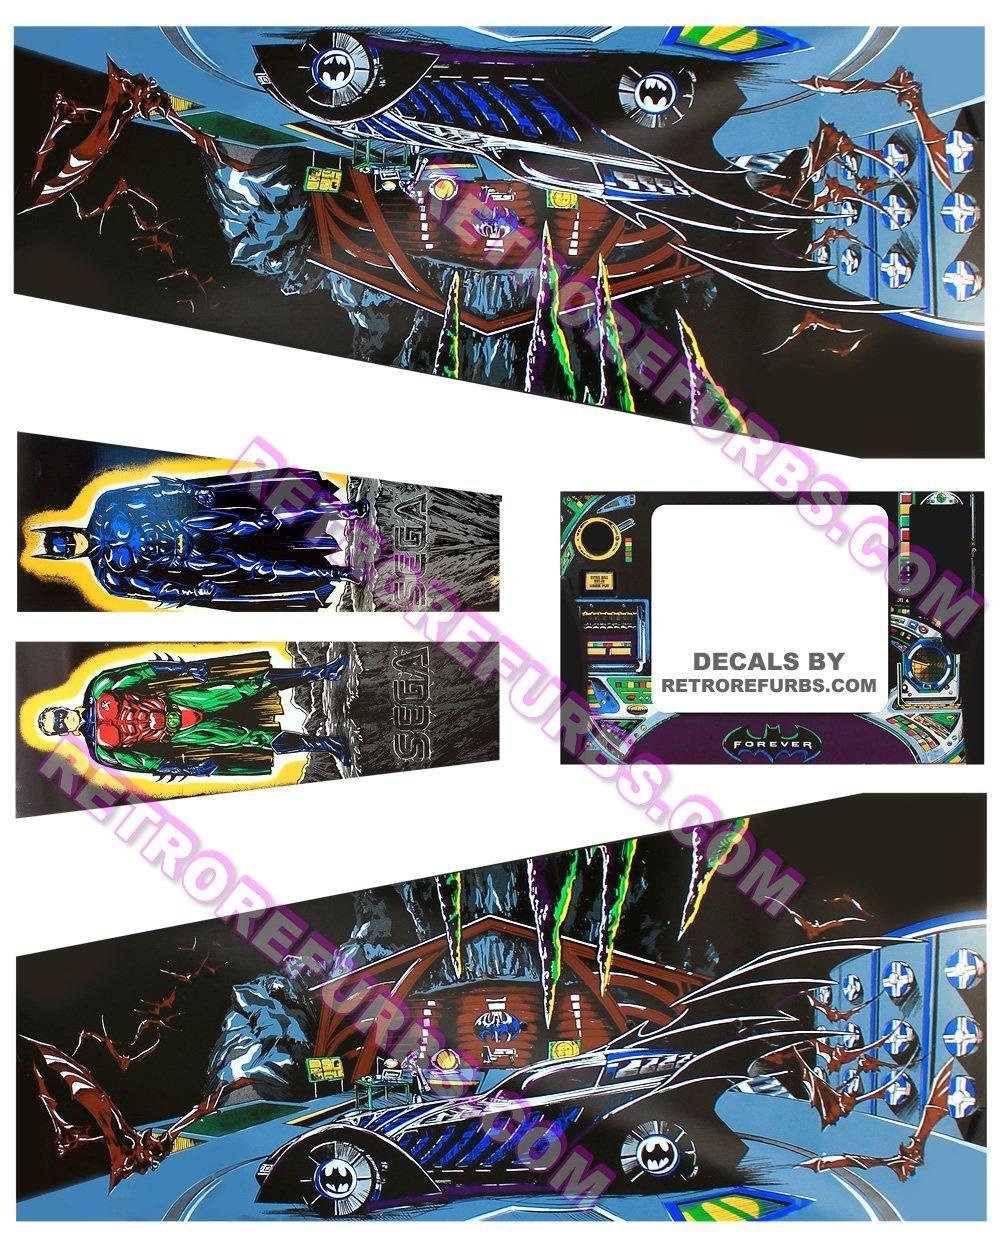 Batman Forever - SEGA Pinball Cabinet Decals - Retro Refurbs